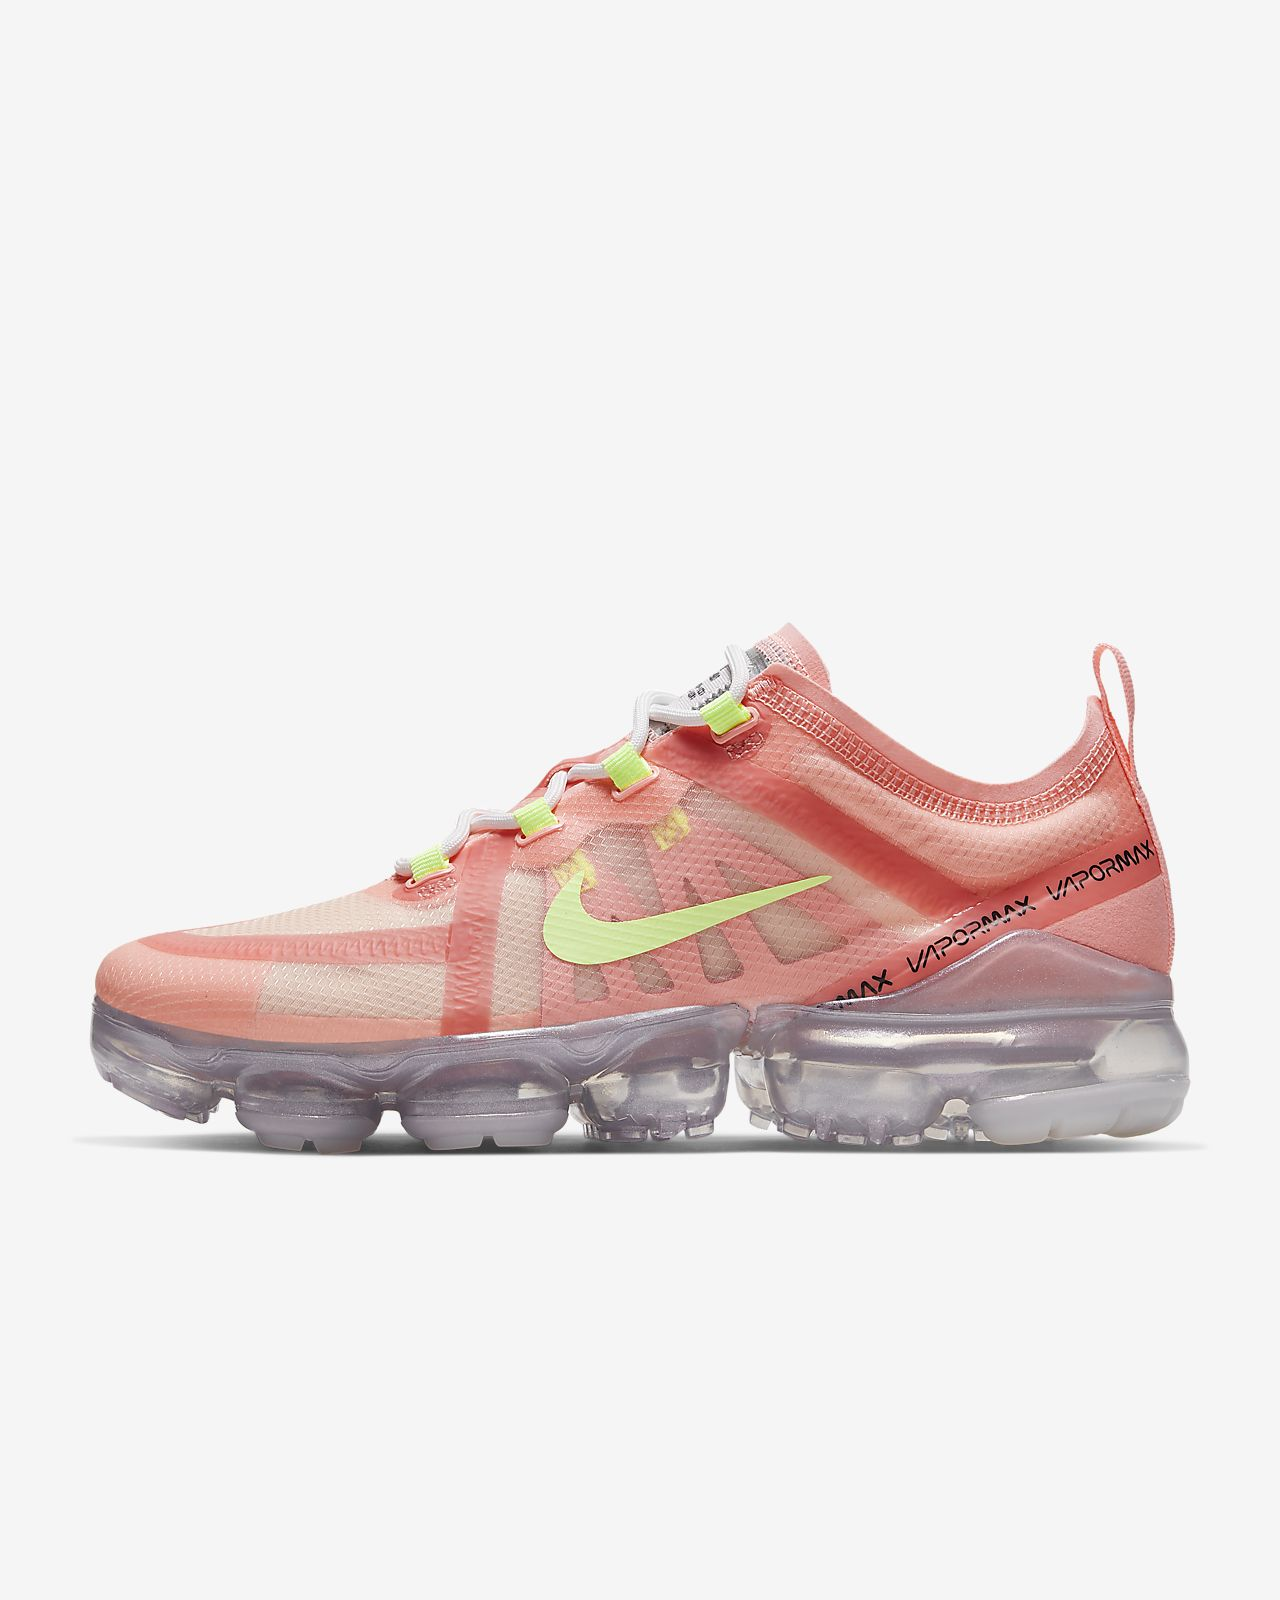 lowest price f7d2d 122f3 ... Chaussure Nike Air VaporMax 2019 pour Femme